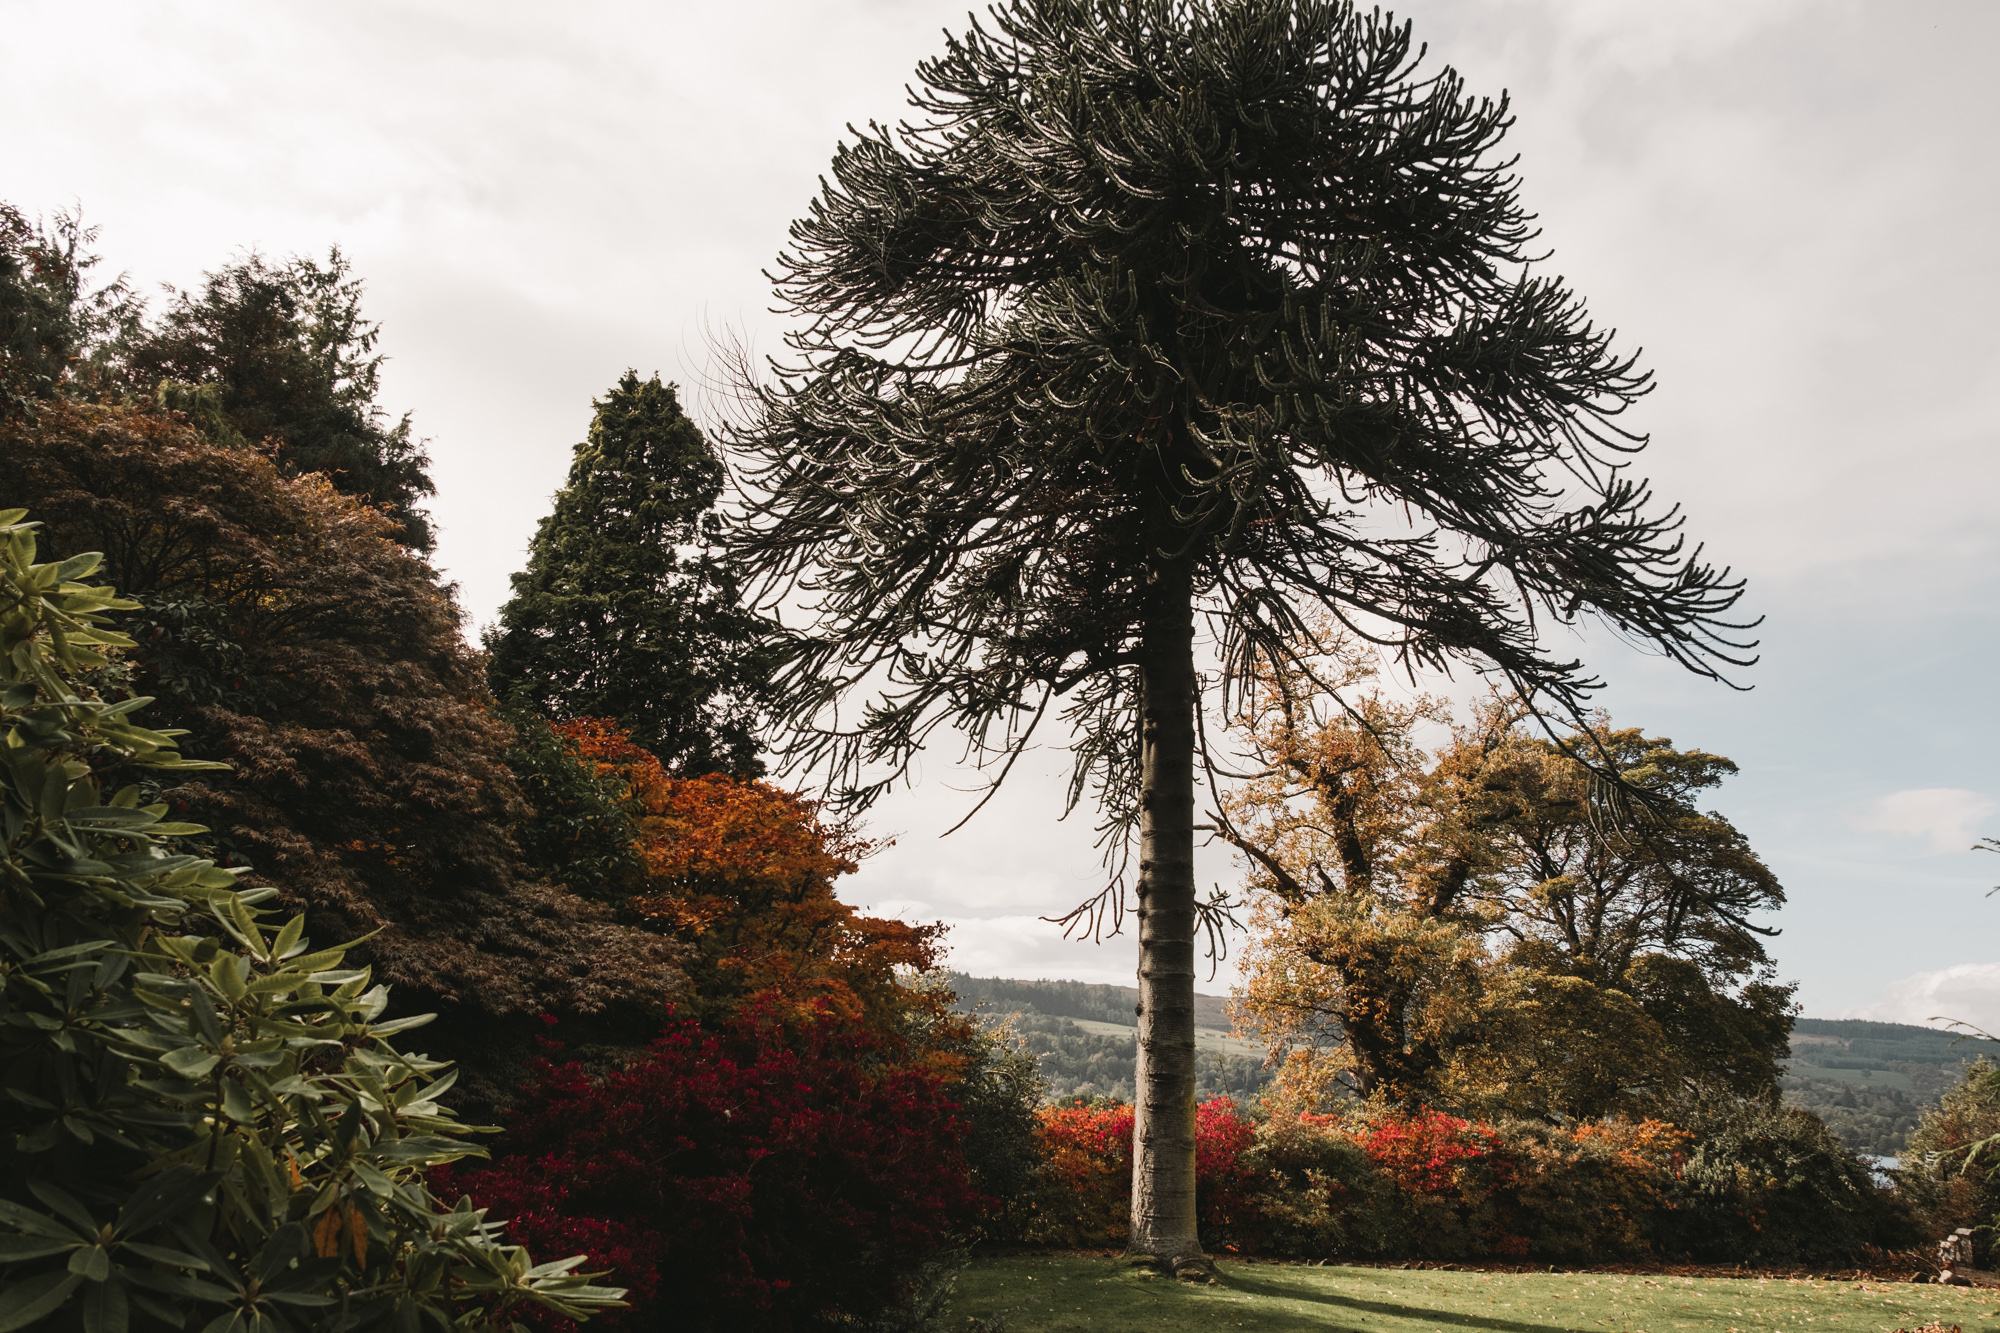 Balloch-castle-country-park-scotland-17.jpg